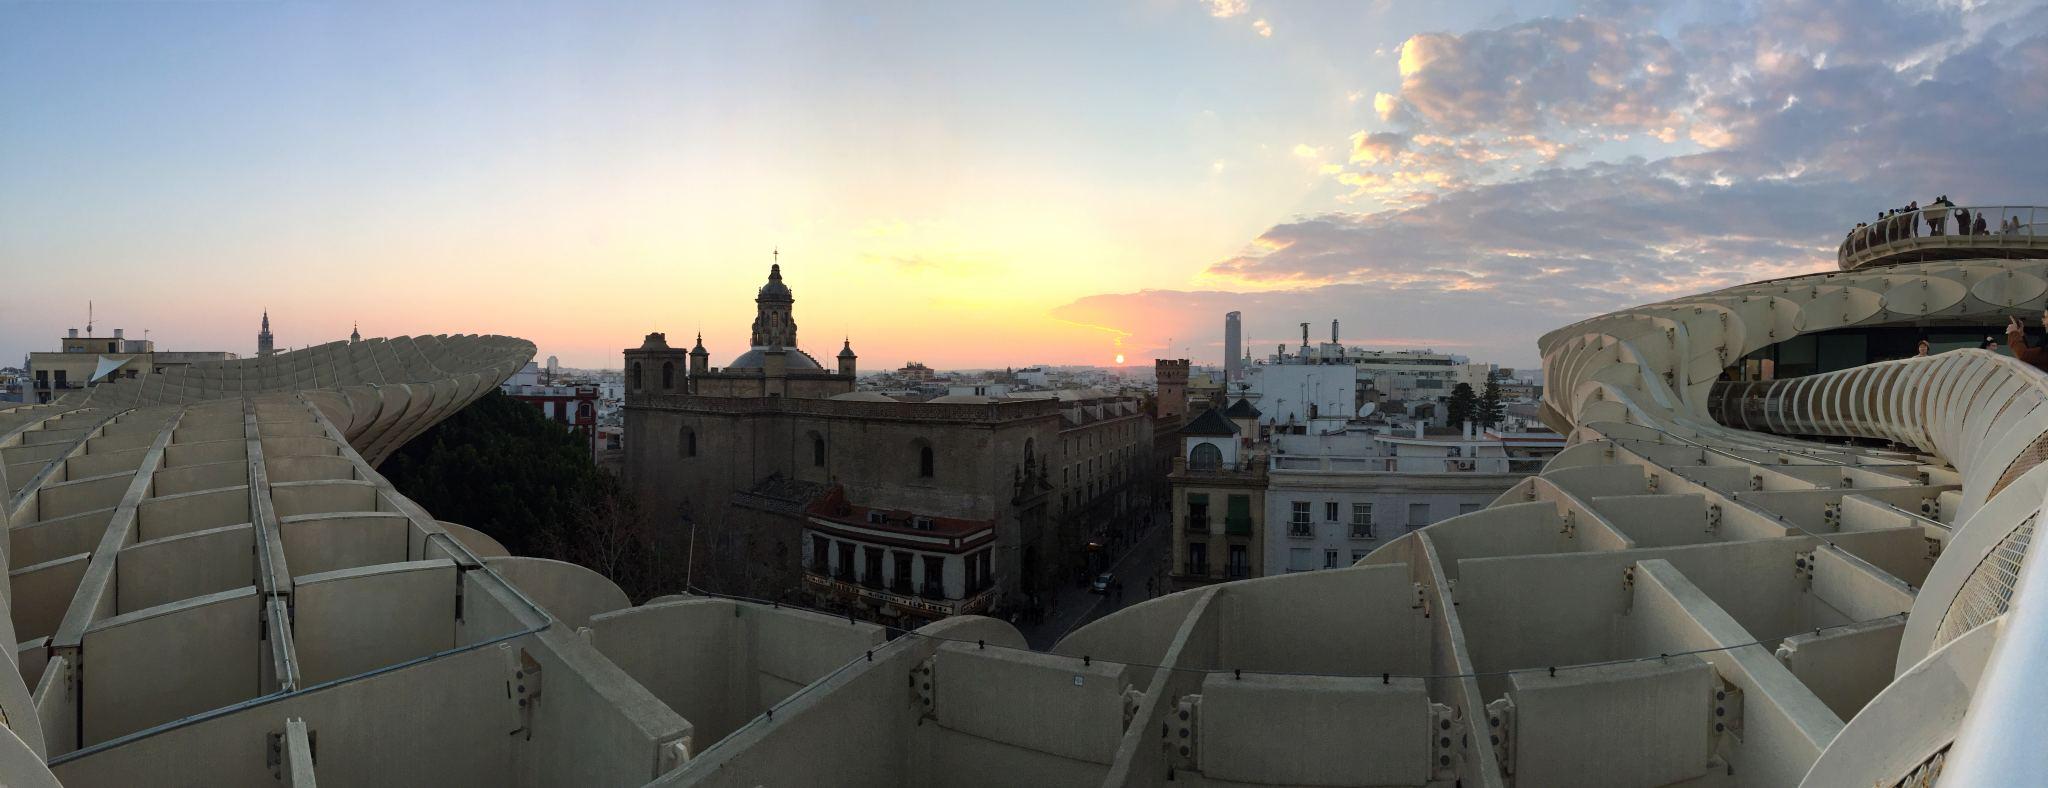 Seville Photo Diary